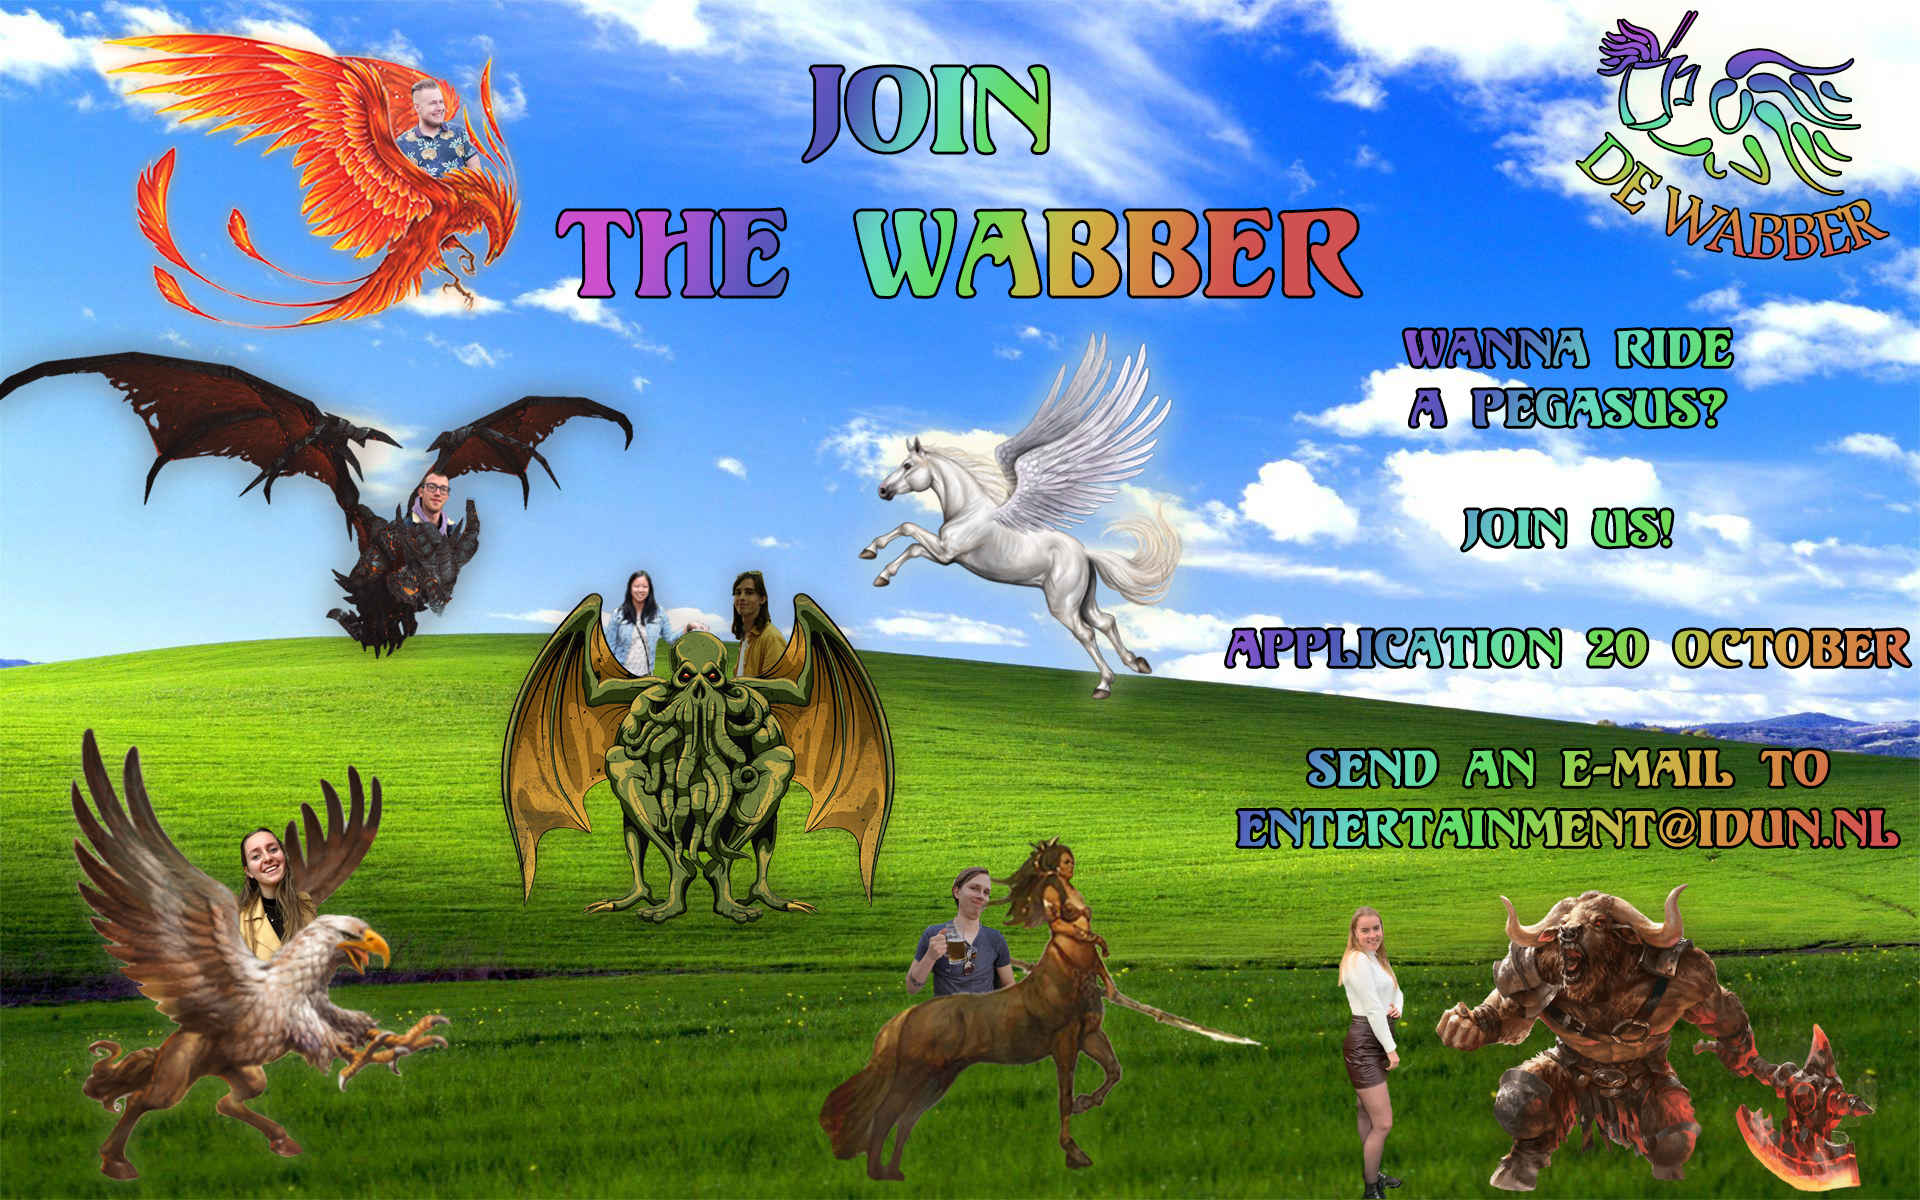 Wabber Applications